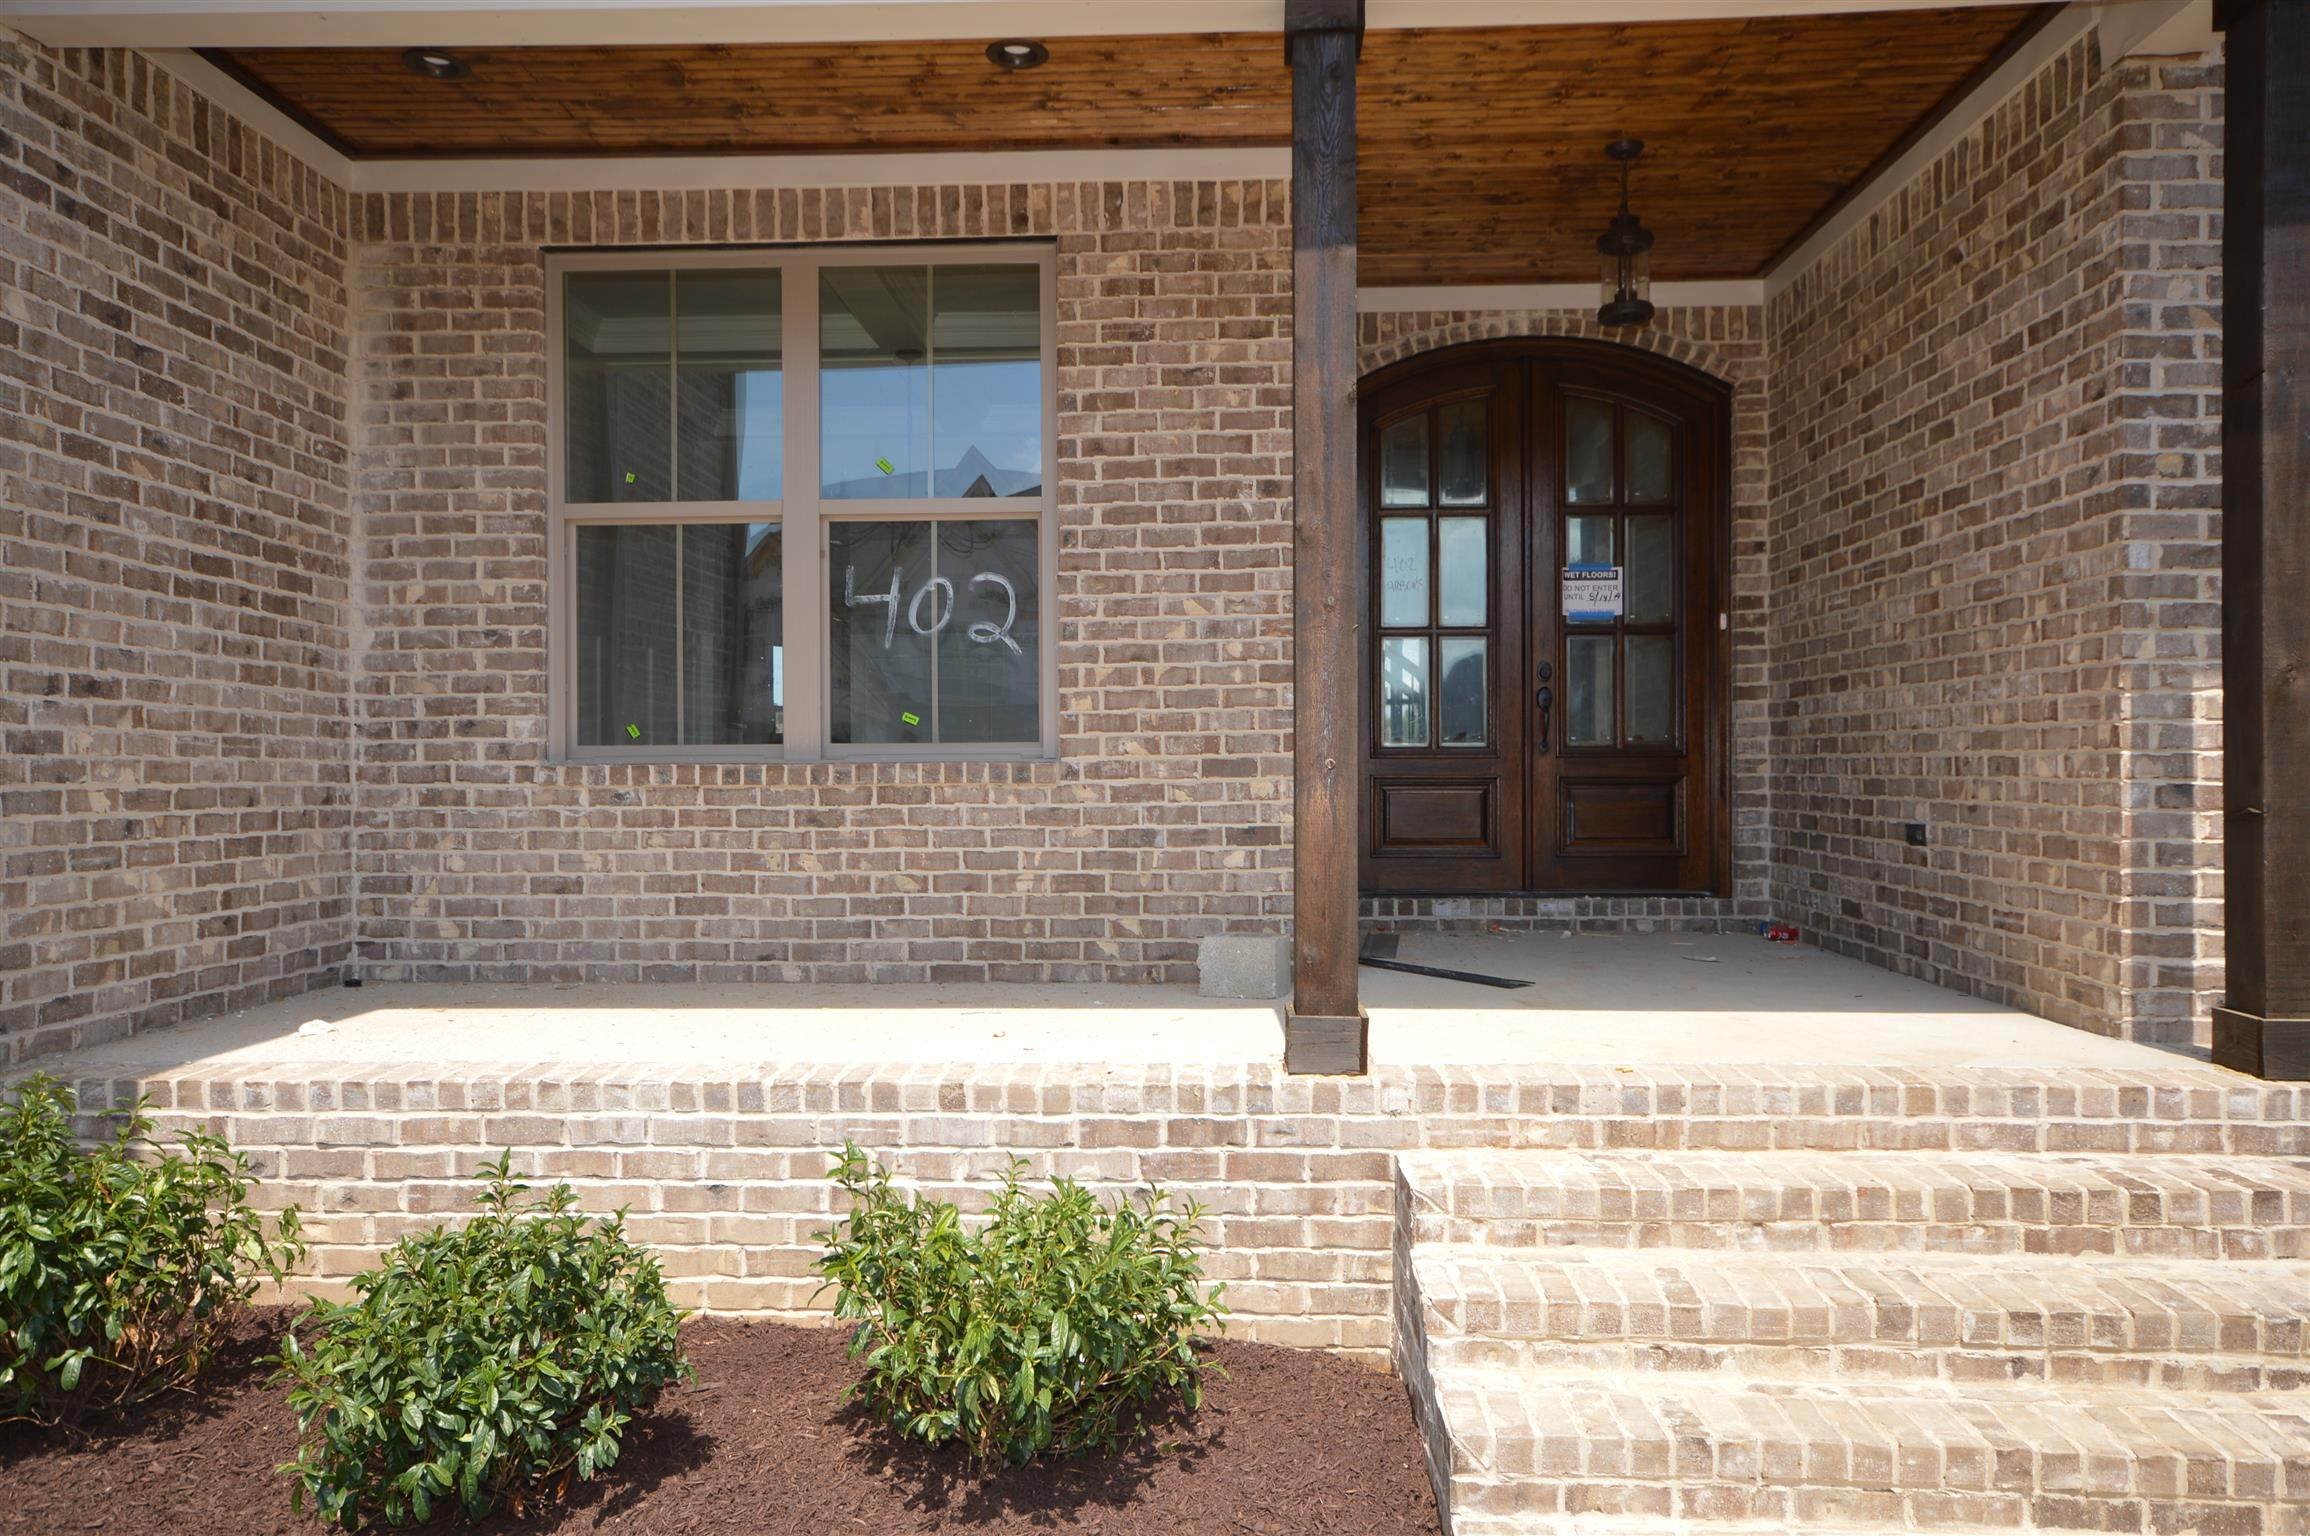 1017 Alpaca Drive (402), Spring Hill, TN 37174 - Spring Hill, TN real estate listing